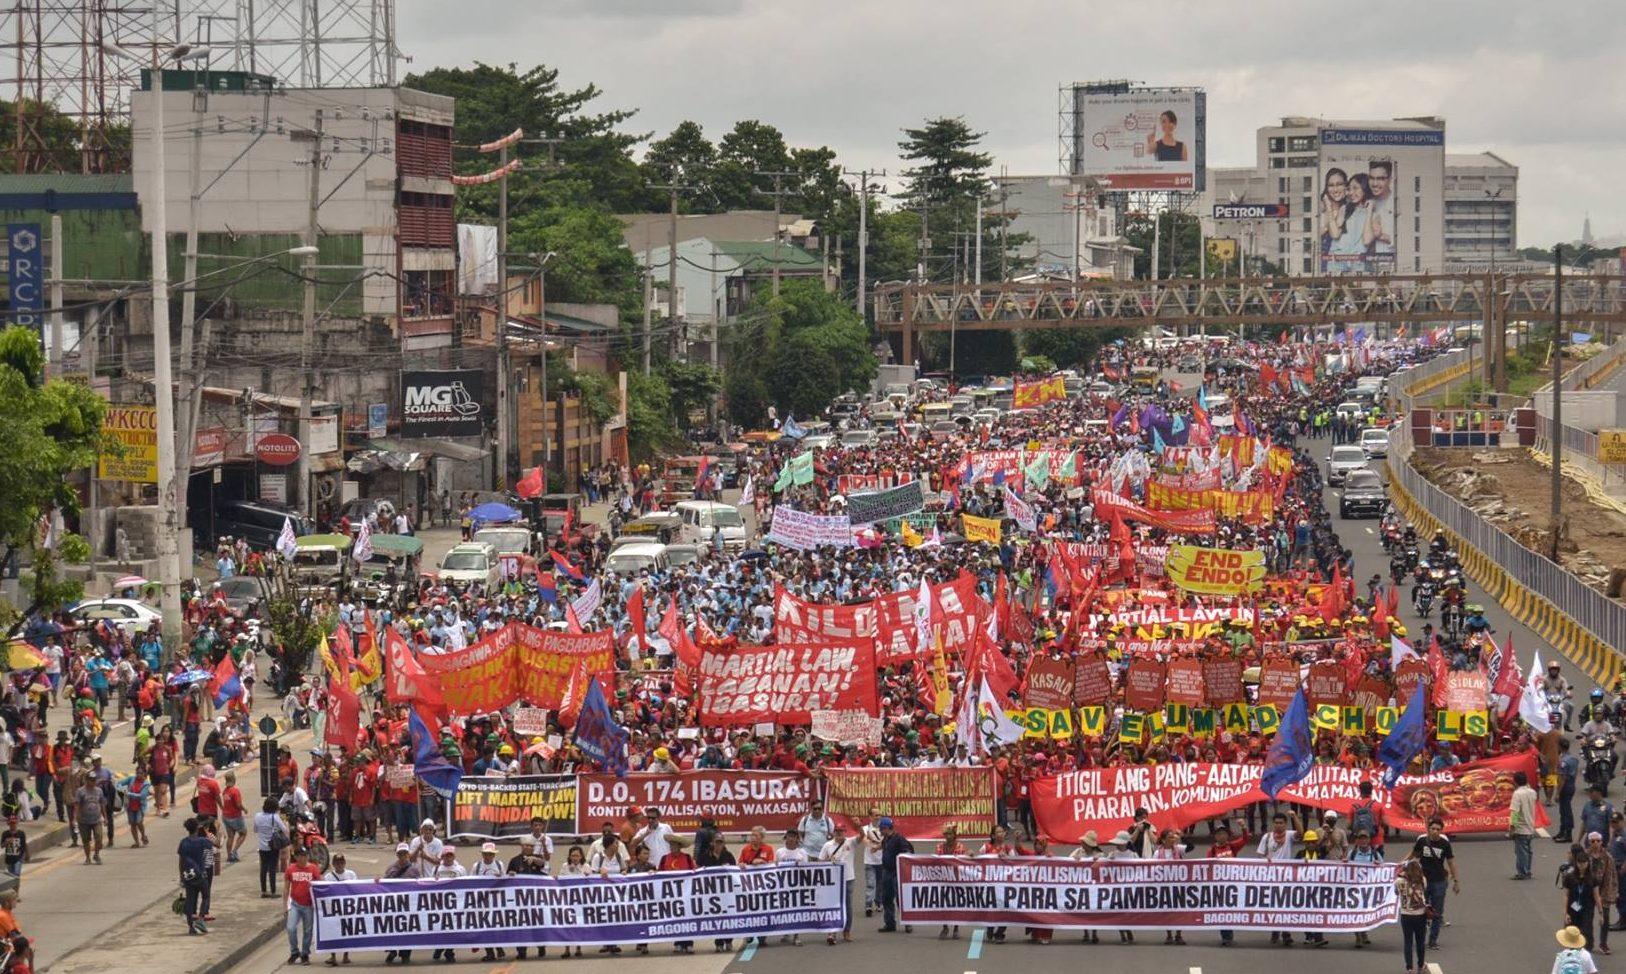 (Photo by Carlo Manalansan/Bulatlat)